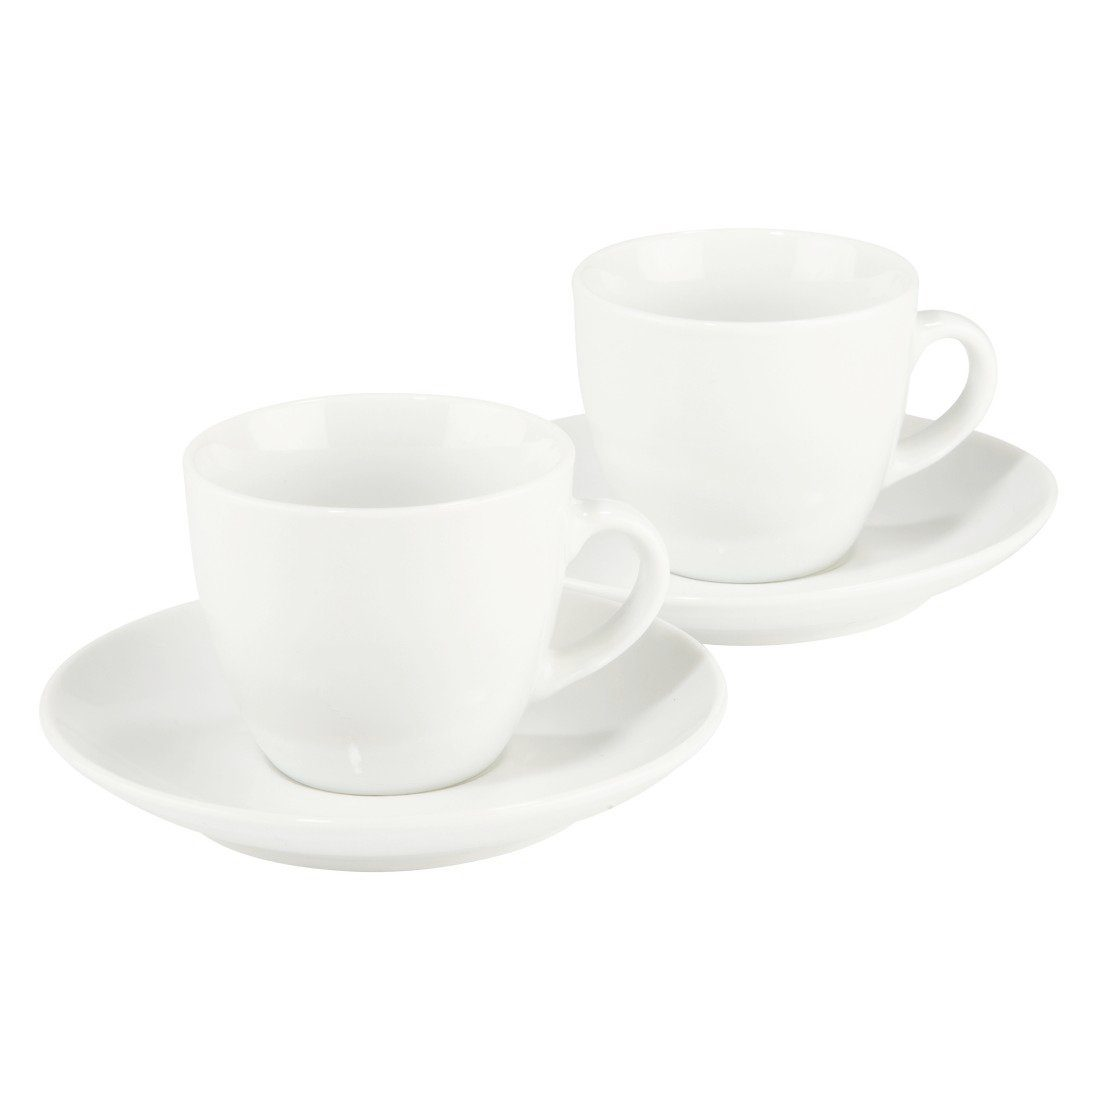 Xavax Espressotassen Set 4-teilig, 2 Tassen, 2 Untertassen, 70 ml »Vacant, Steingut, Mokkatasse«